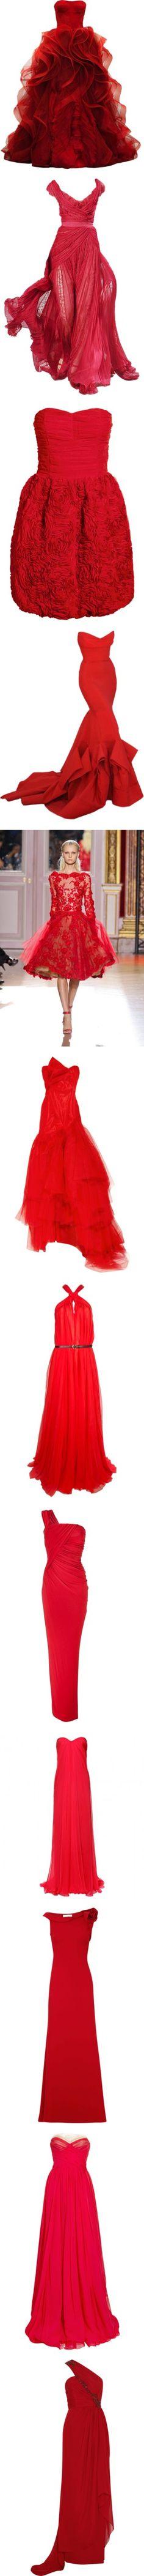 Nothing like wearing red